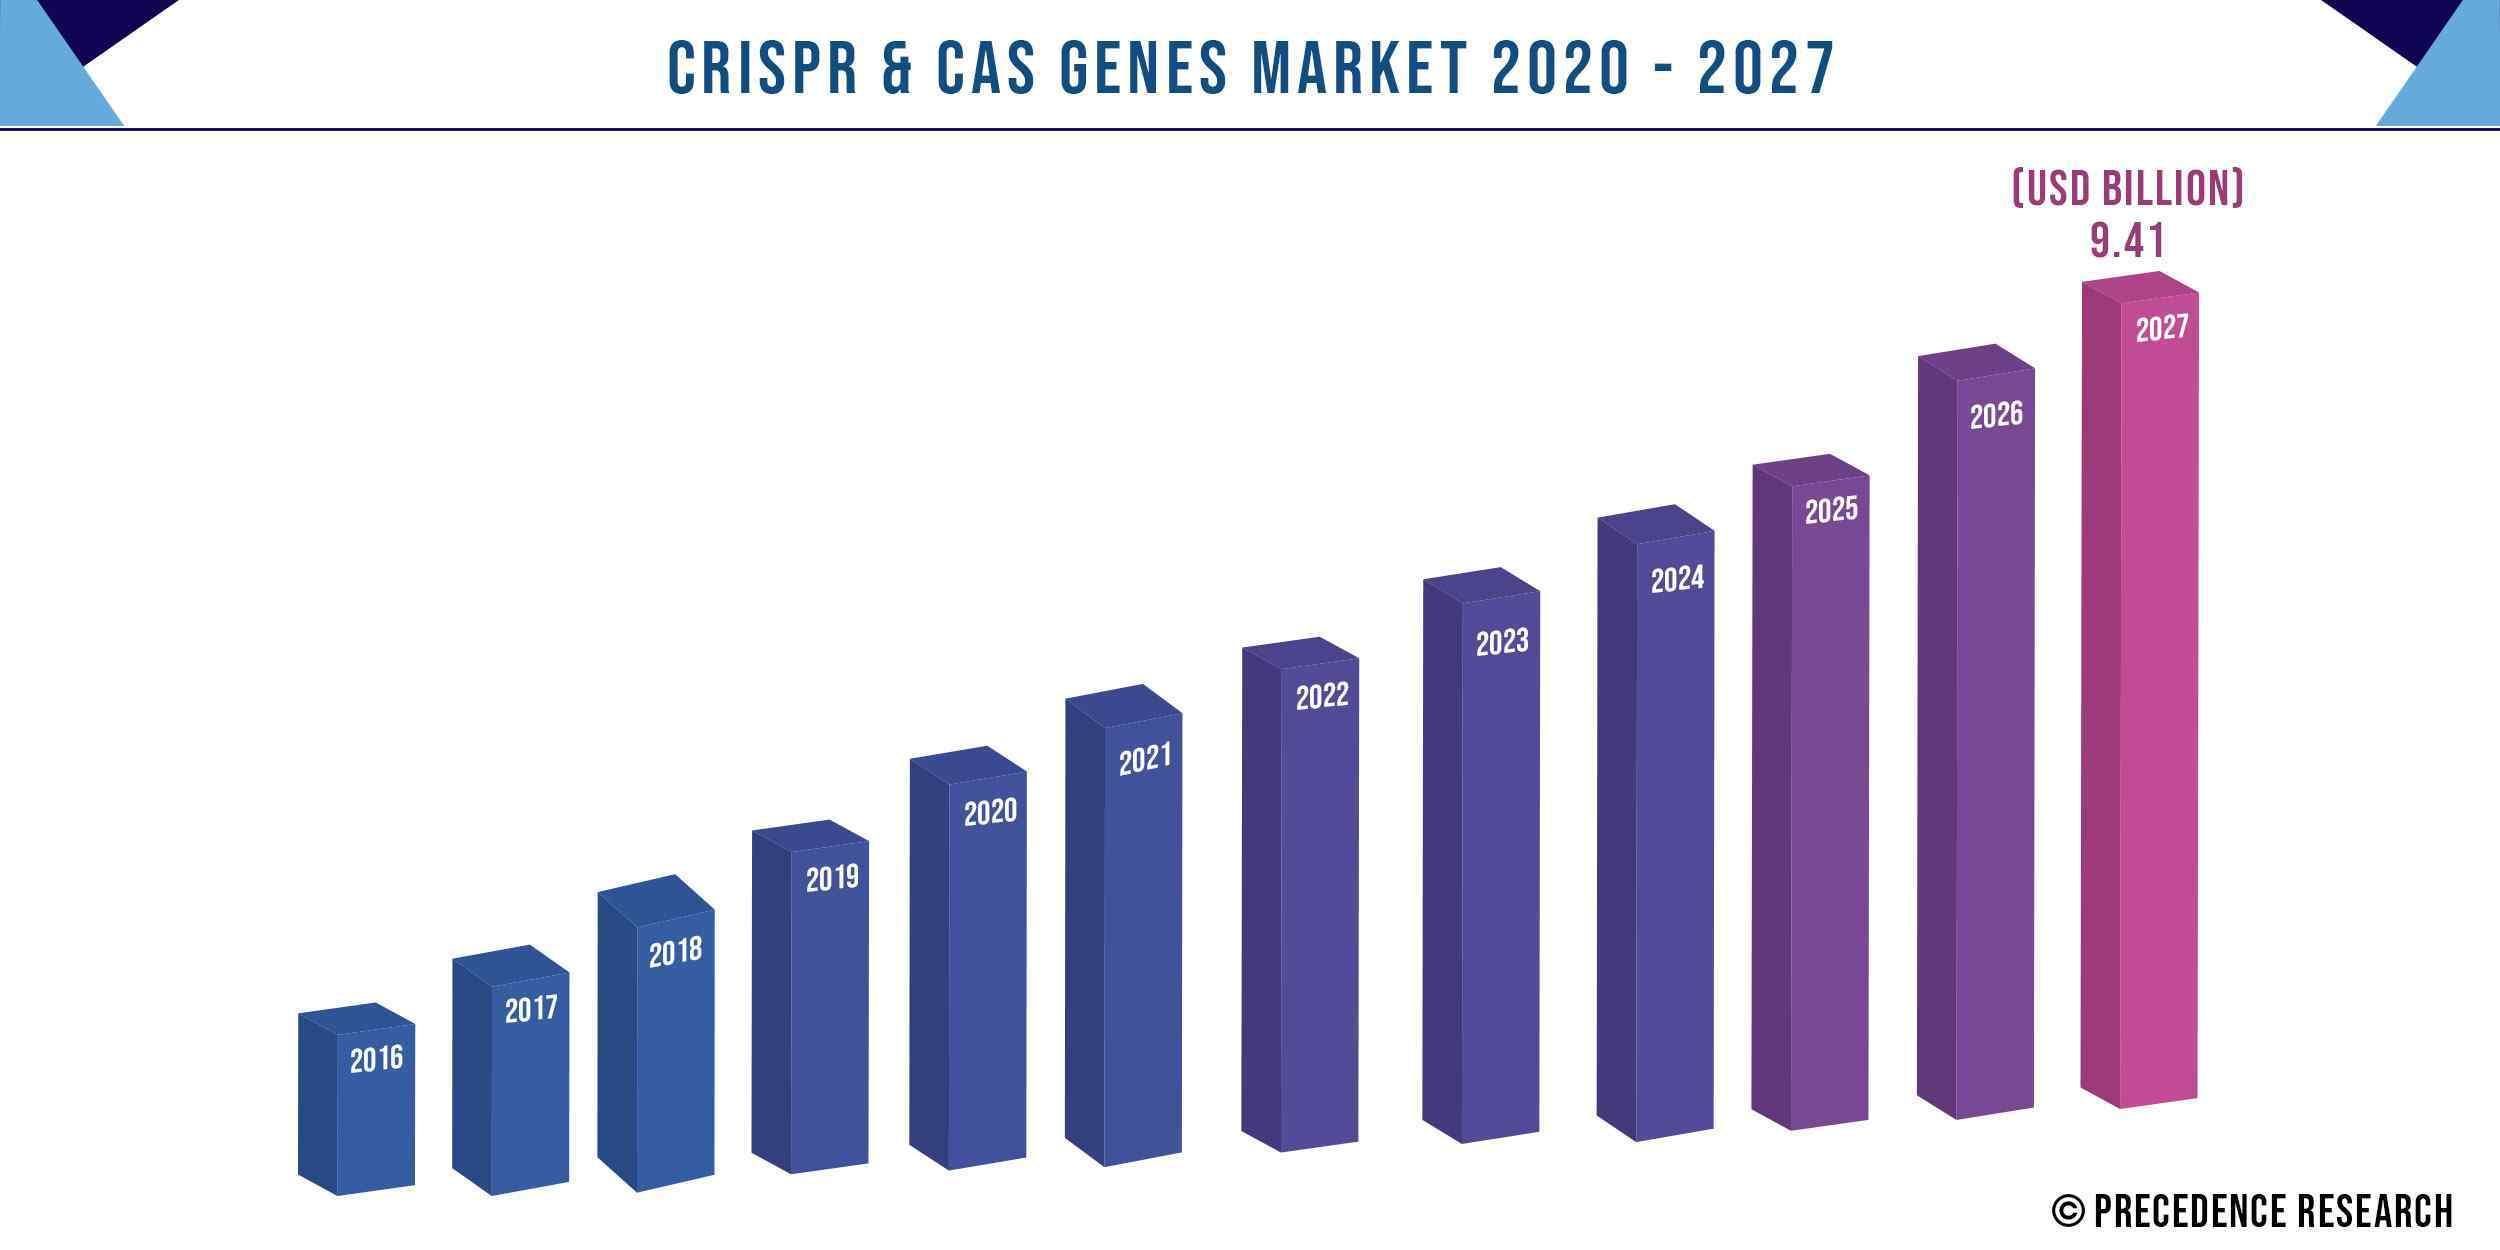 CRISPR and Cas Genes Market Size 2016 to 2027